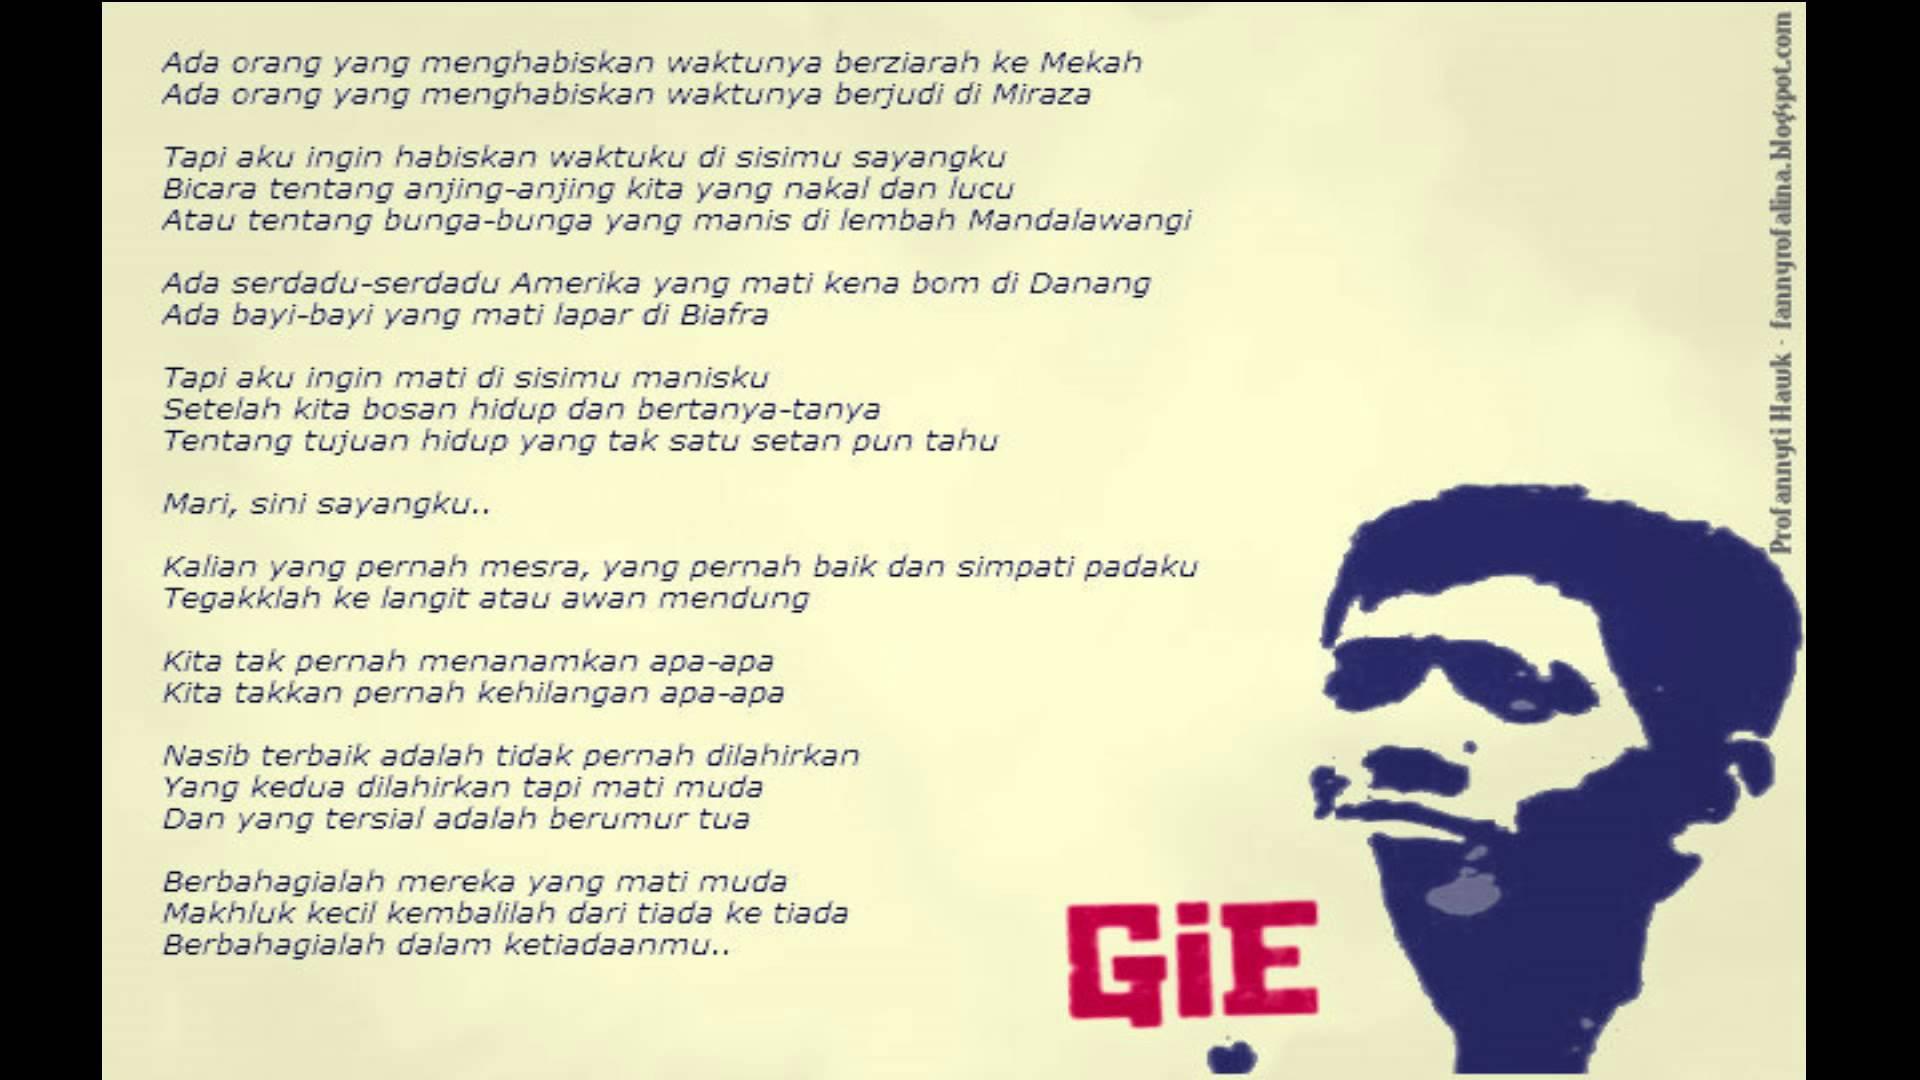 Puisi Terakhir Soe Hok Gie